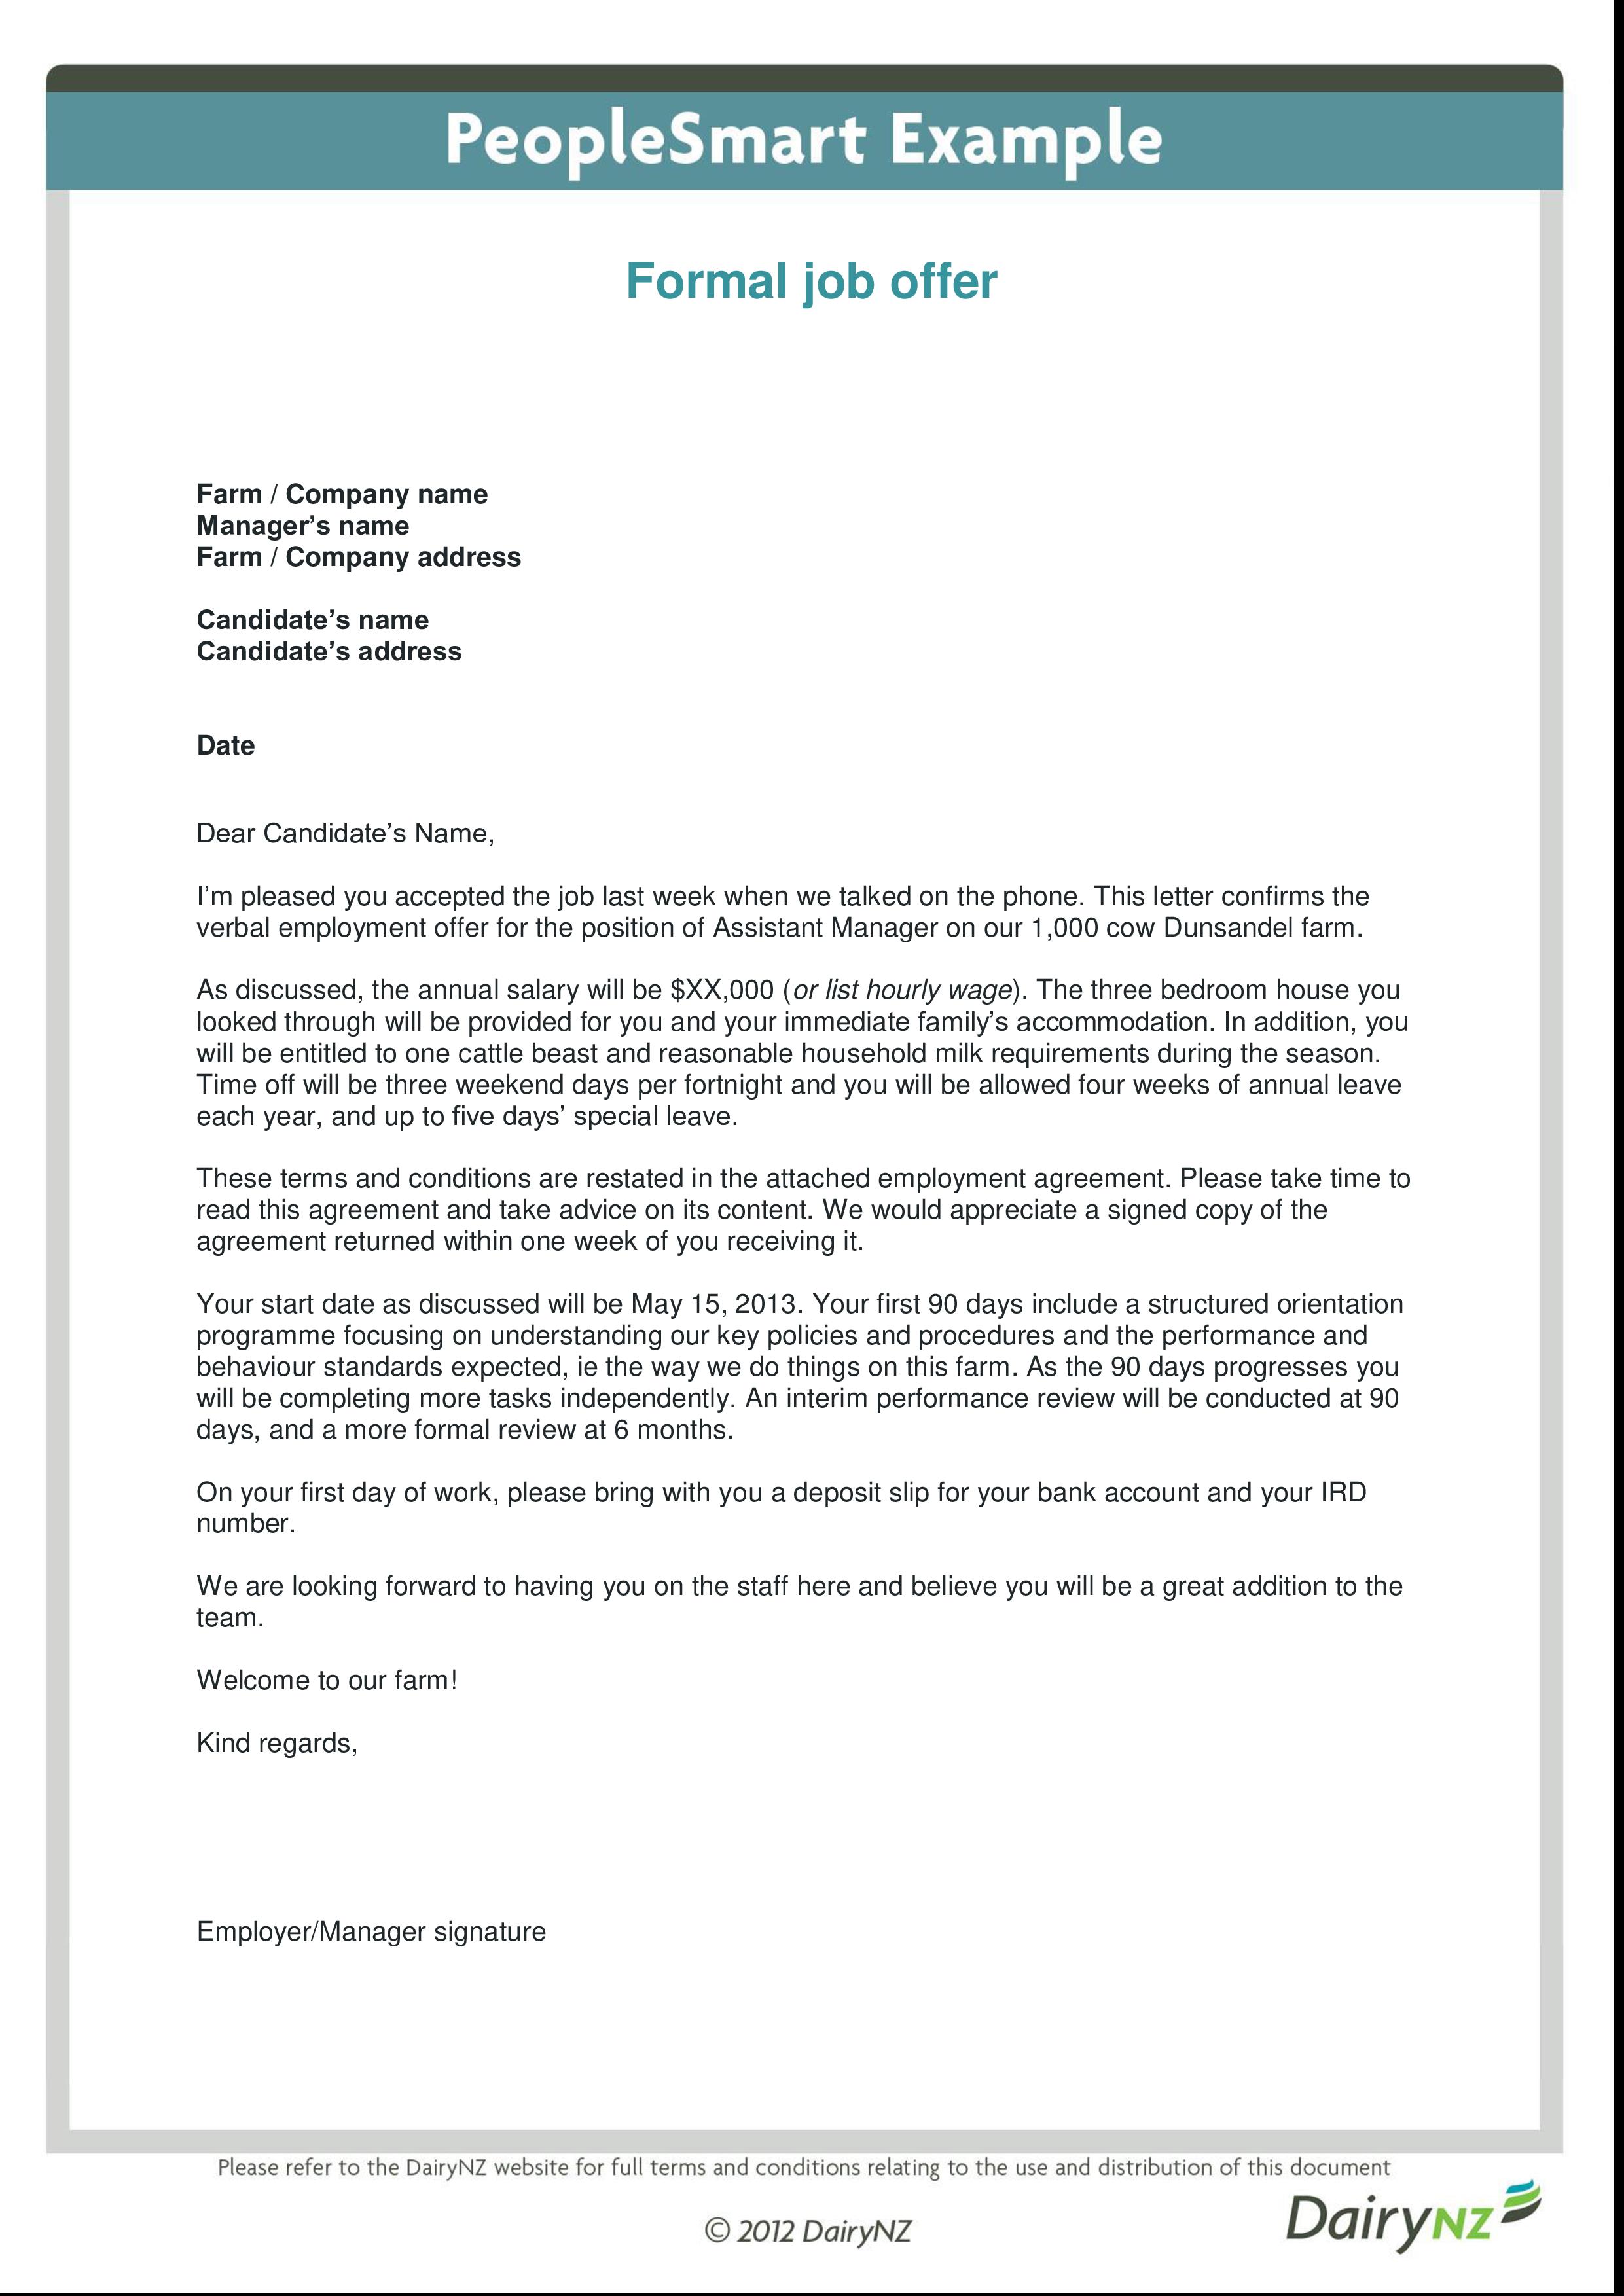 Formal Job Offer Letter from www.allbusinesstemplates.com